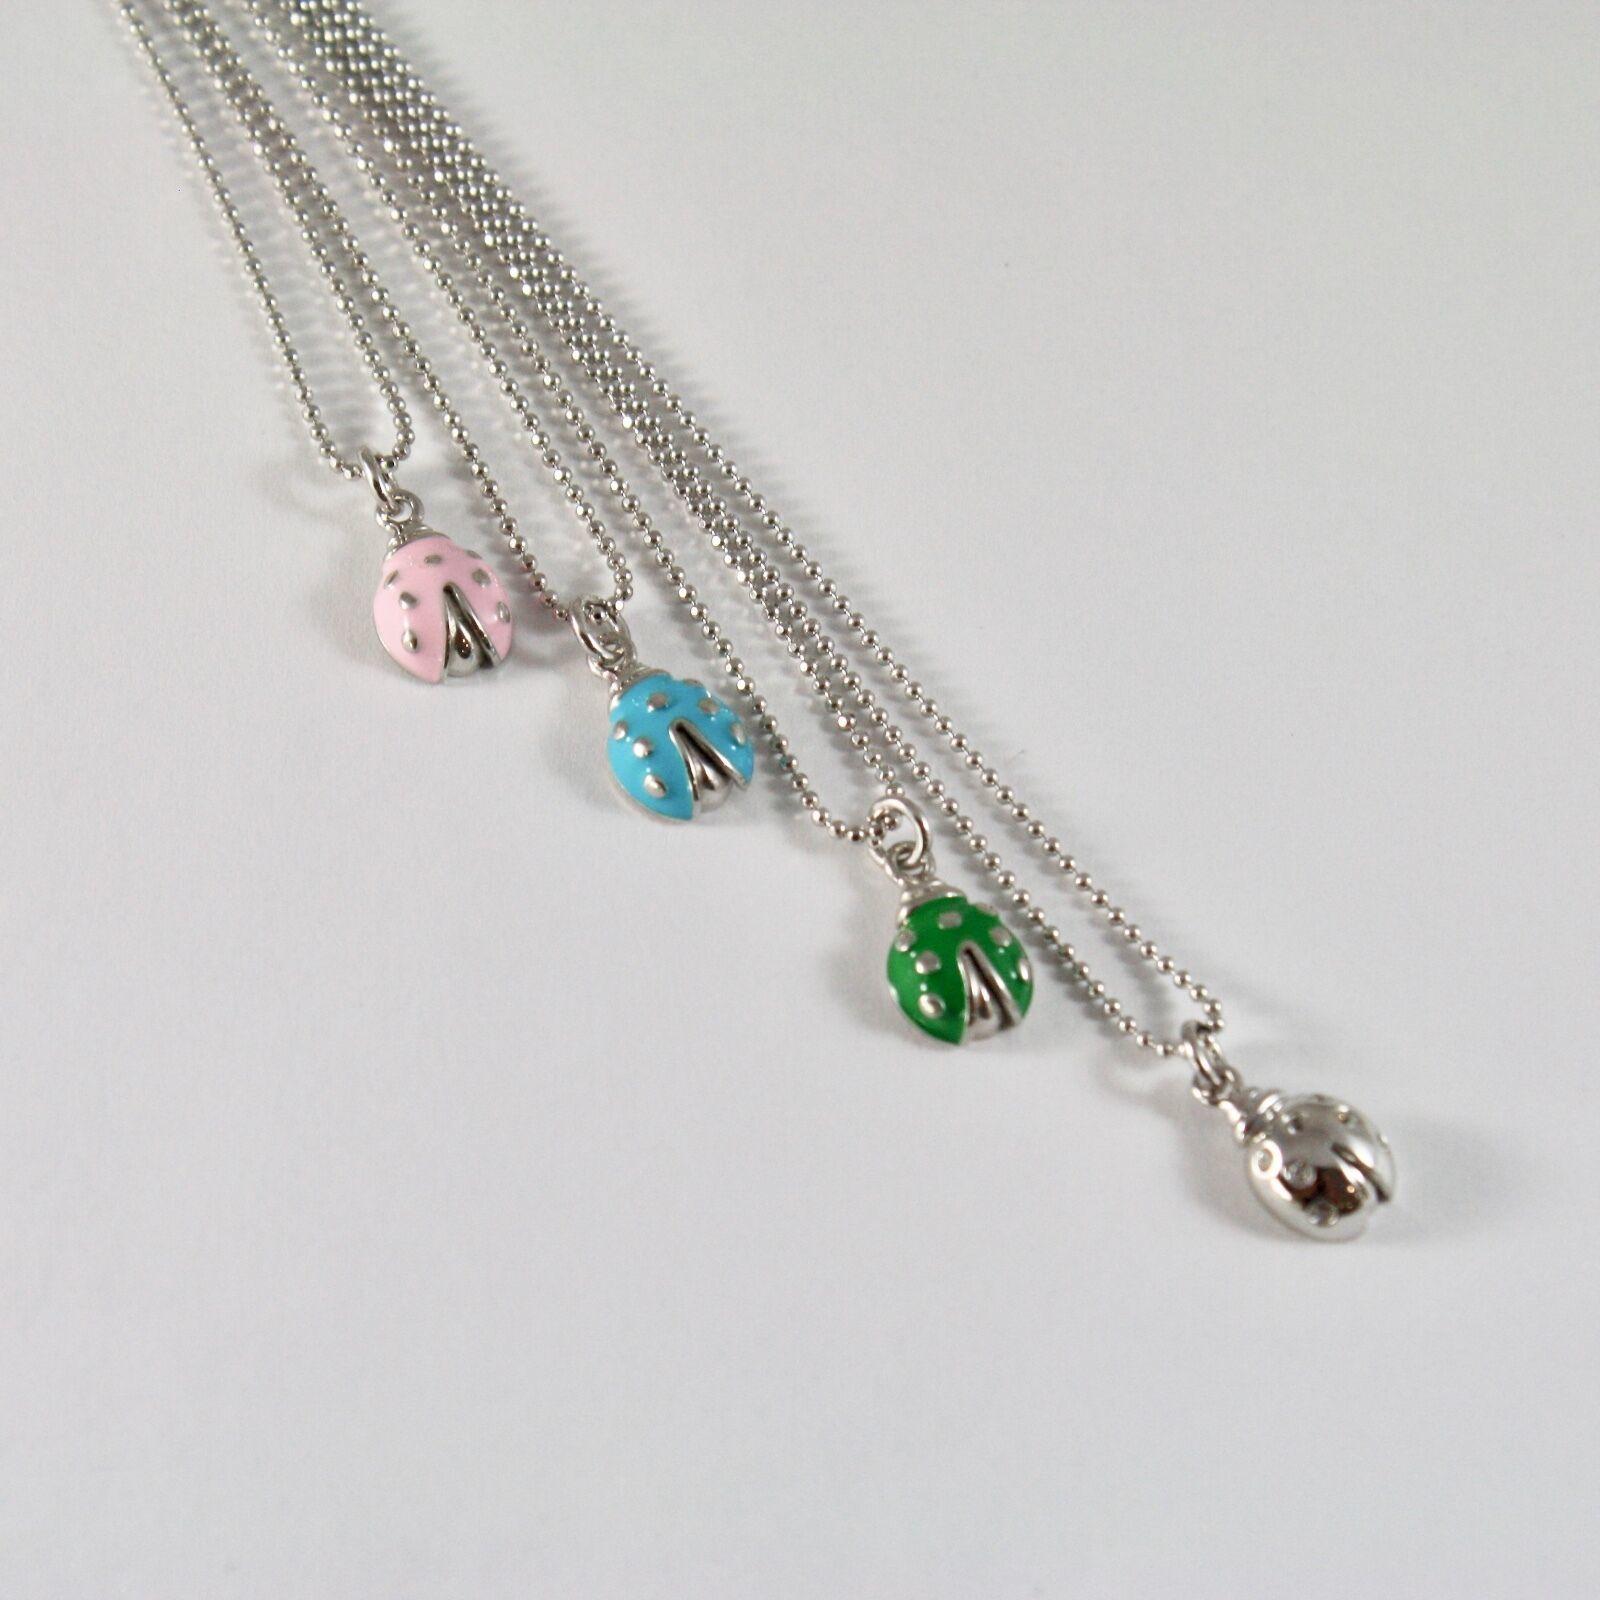 Silver Necklace 925 Jack&co with Balls Shiny and Ladybug Enamelled 45 CM